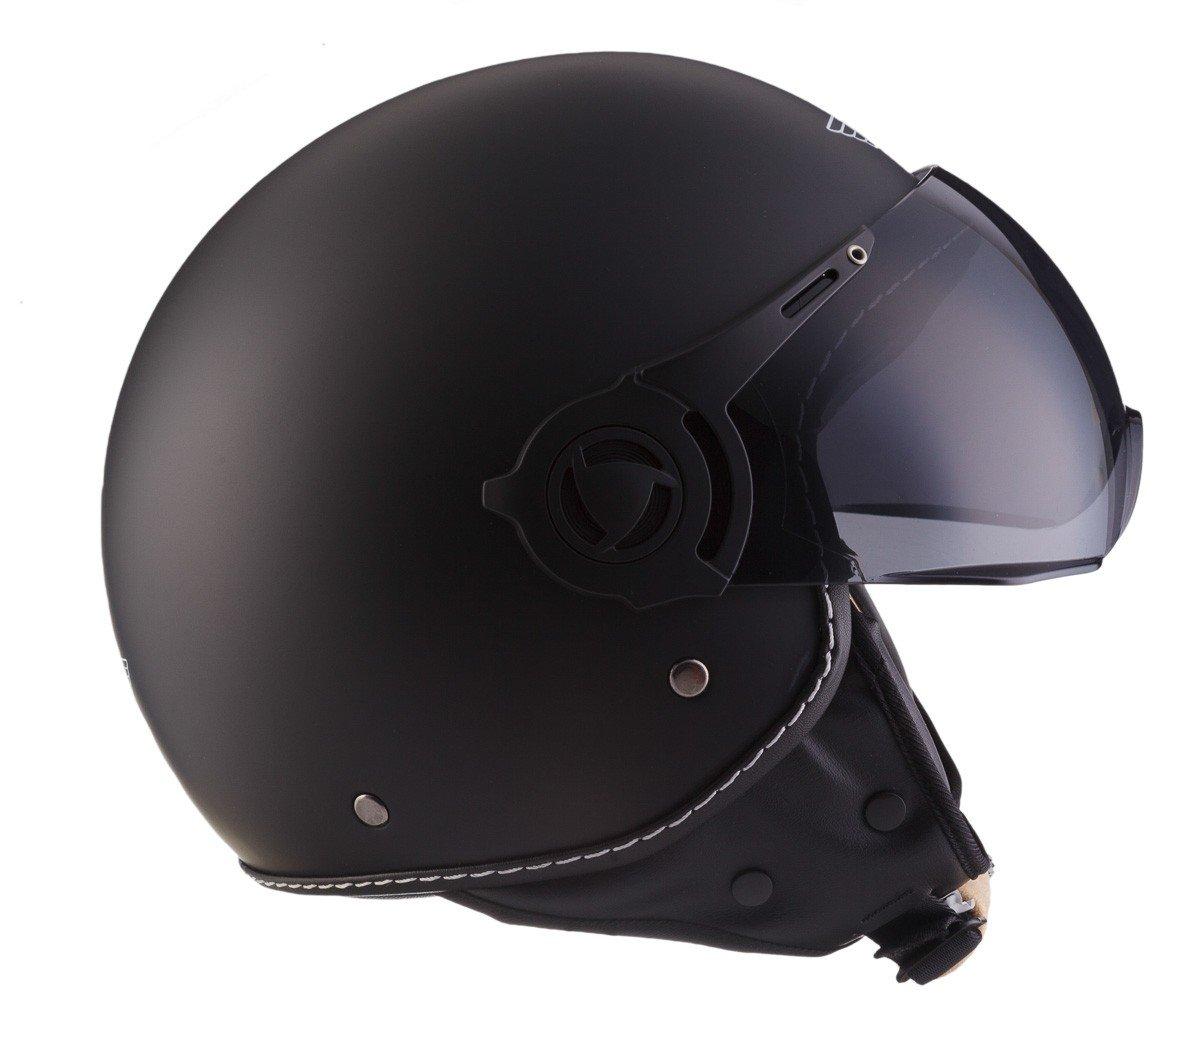 Moto Helmets H44/Biker Motorcycle Helmet Vintage moped scooter Helmet Chopper Cruiser Pilot Jet Vespa Bobber Scooter Helmet Helmet Helmet Retro ECE Certified with Fabric Bag Bronze